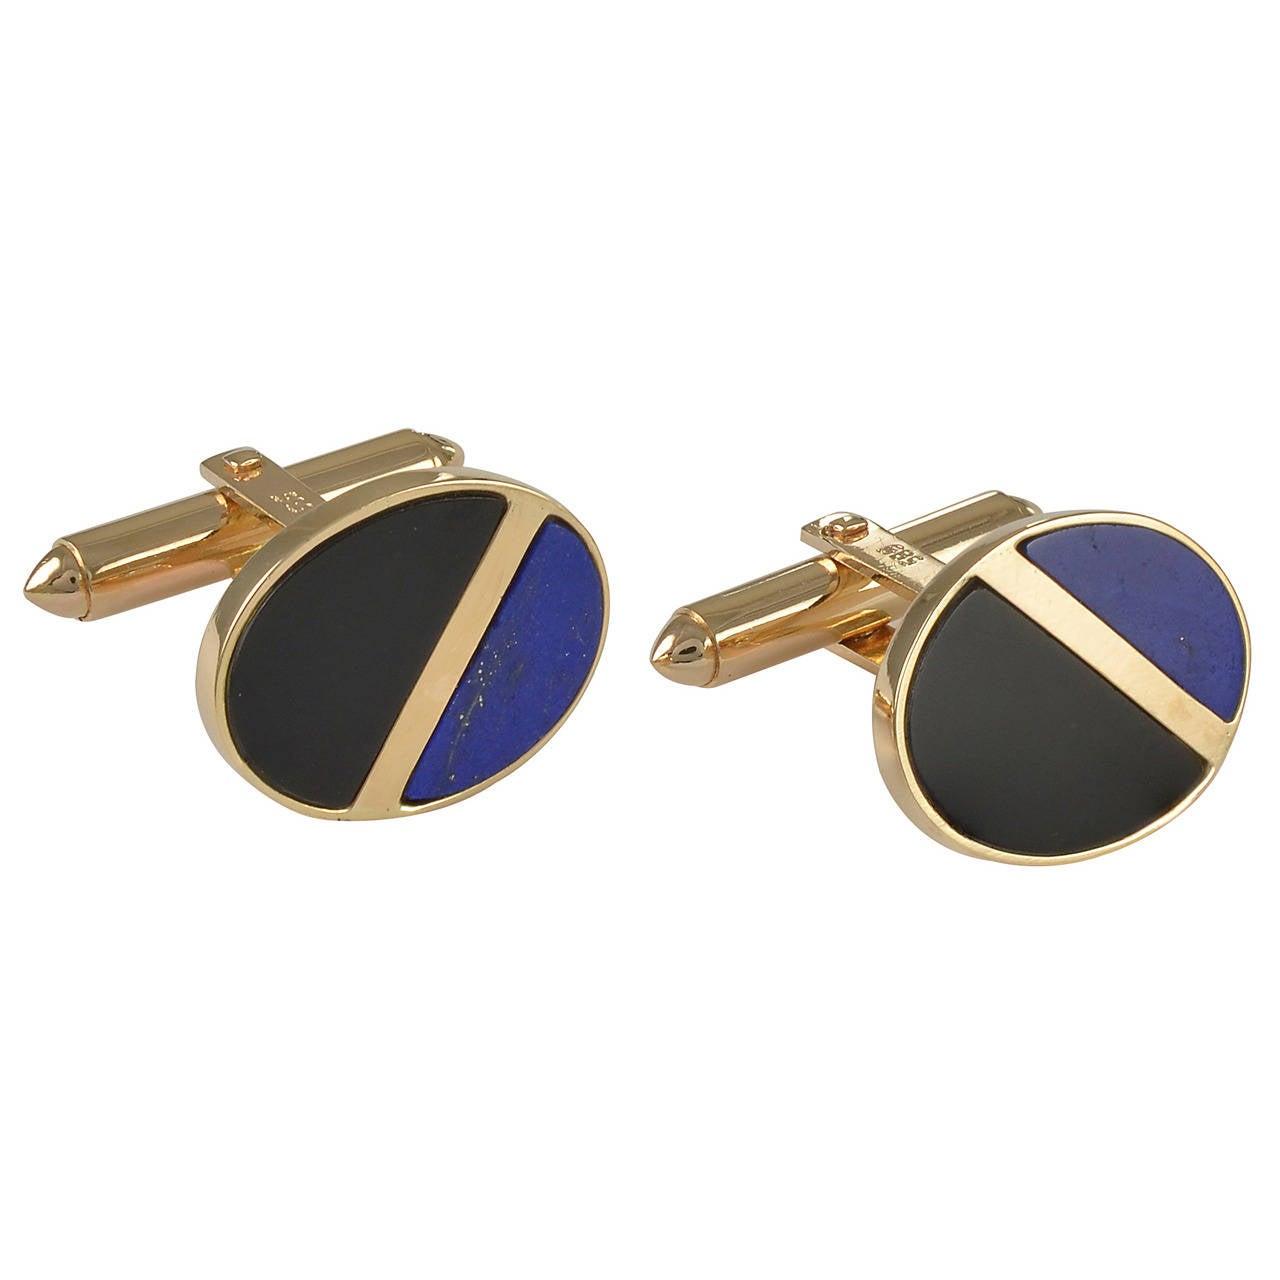 Onyx Lapis Gold Cufflinks